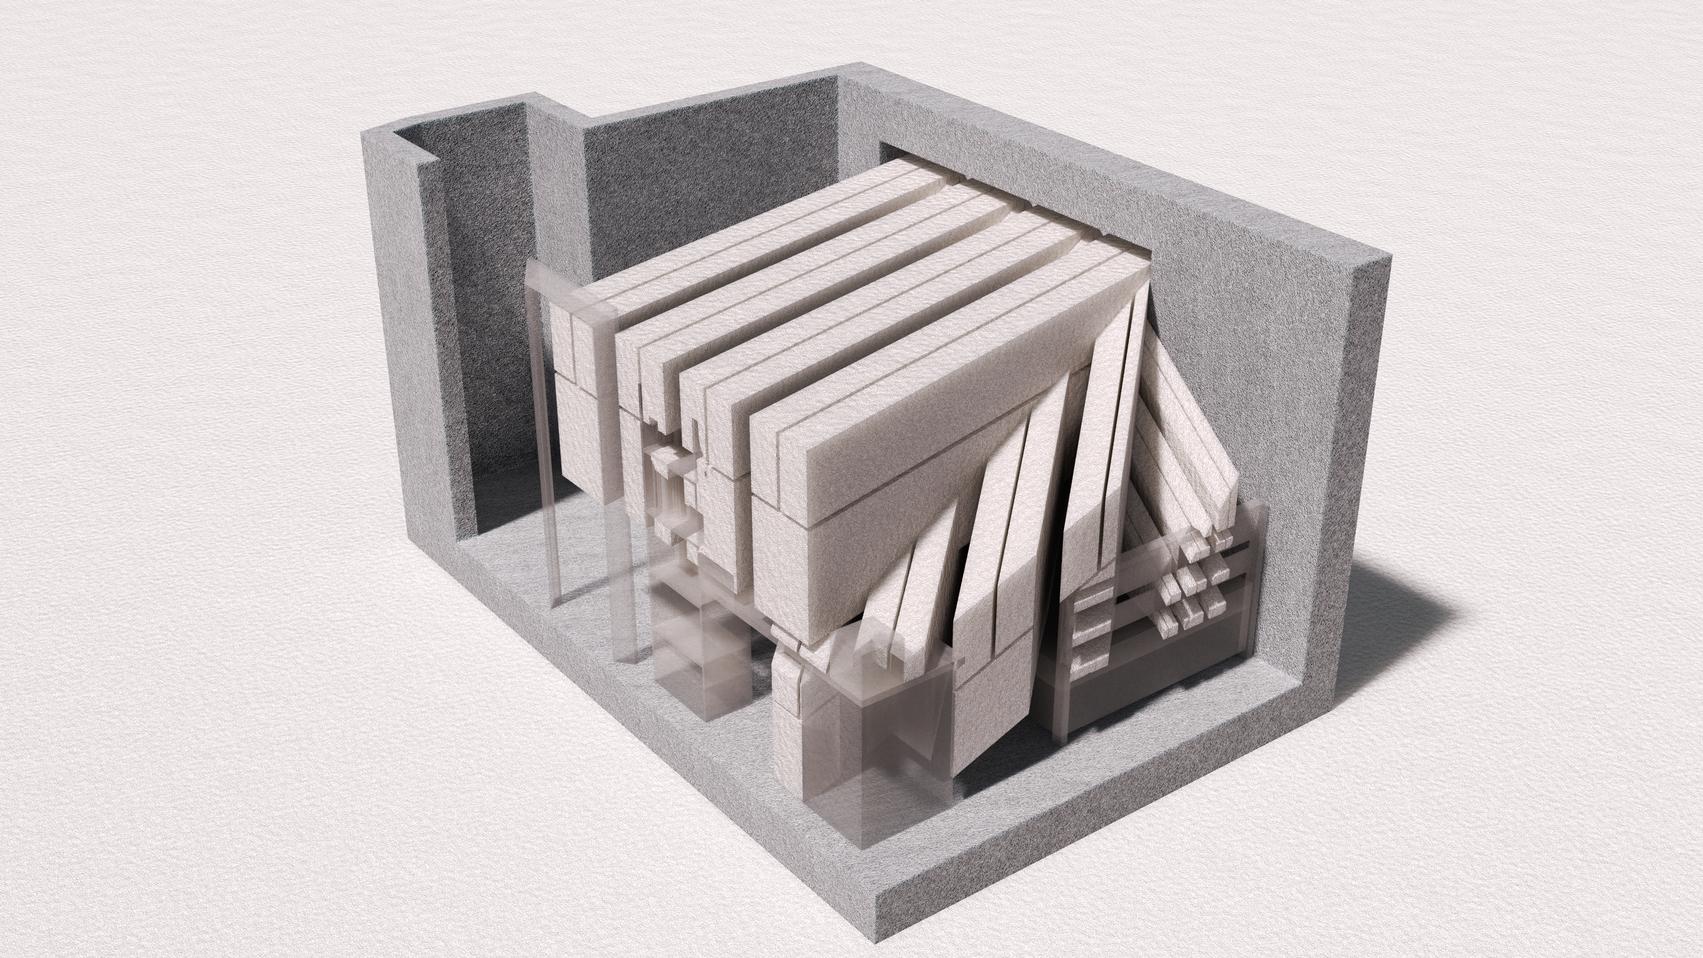 render solids in room.png